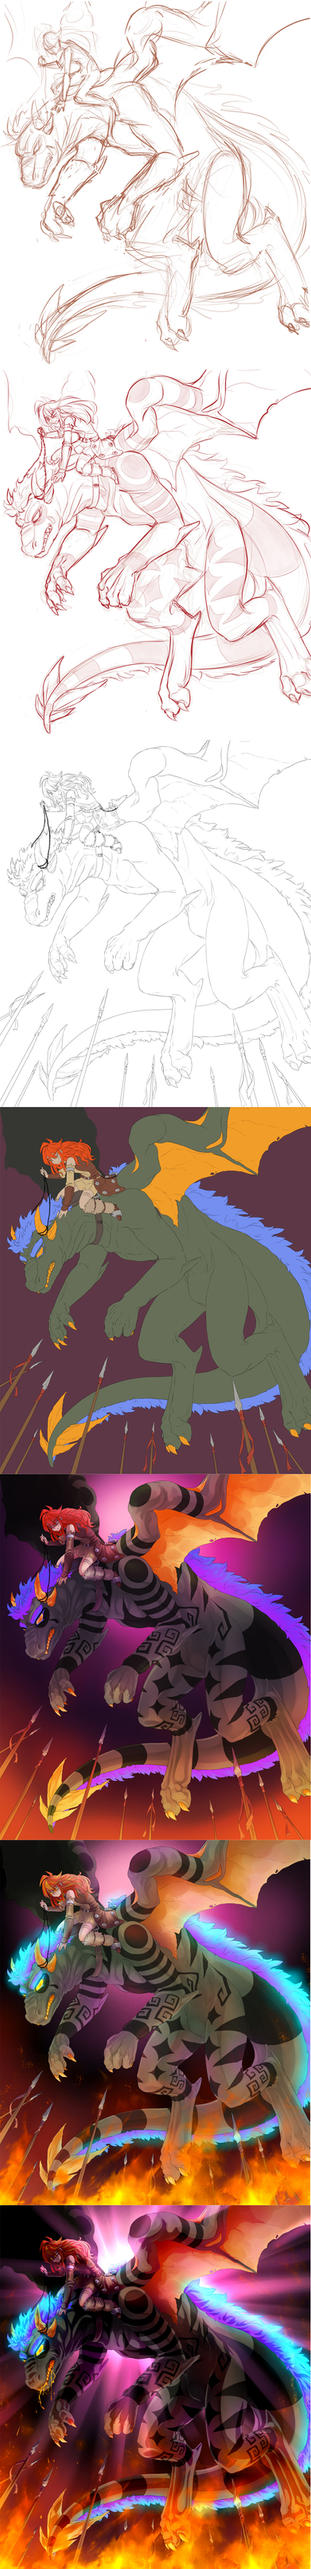 Steps_dragon Flight by KoTana-Poltergeist